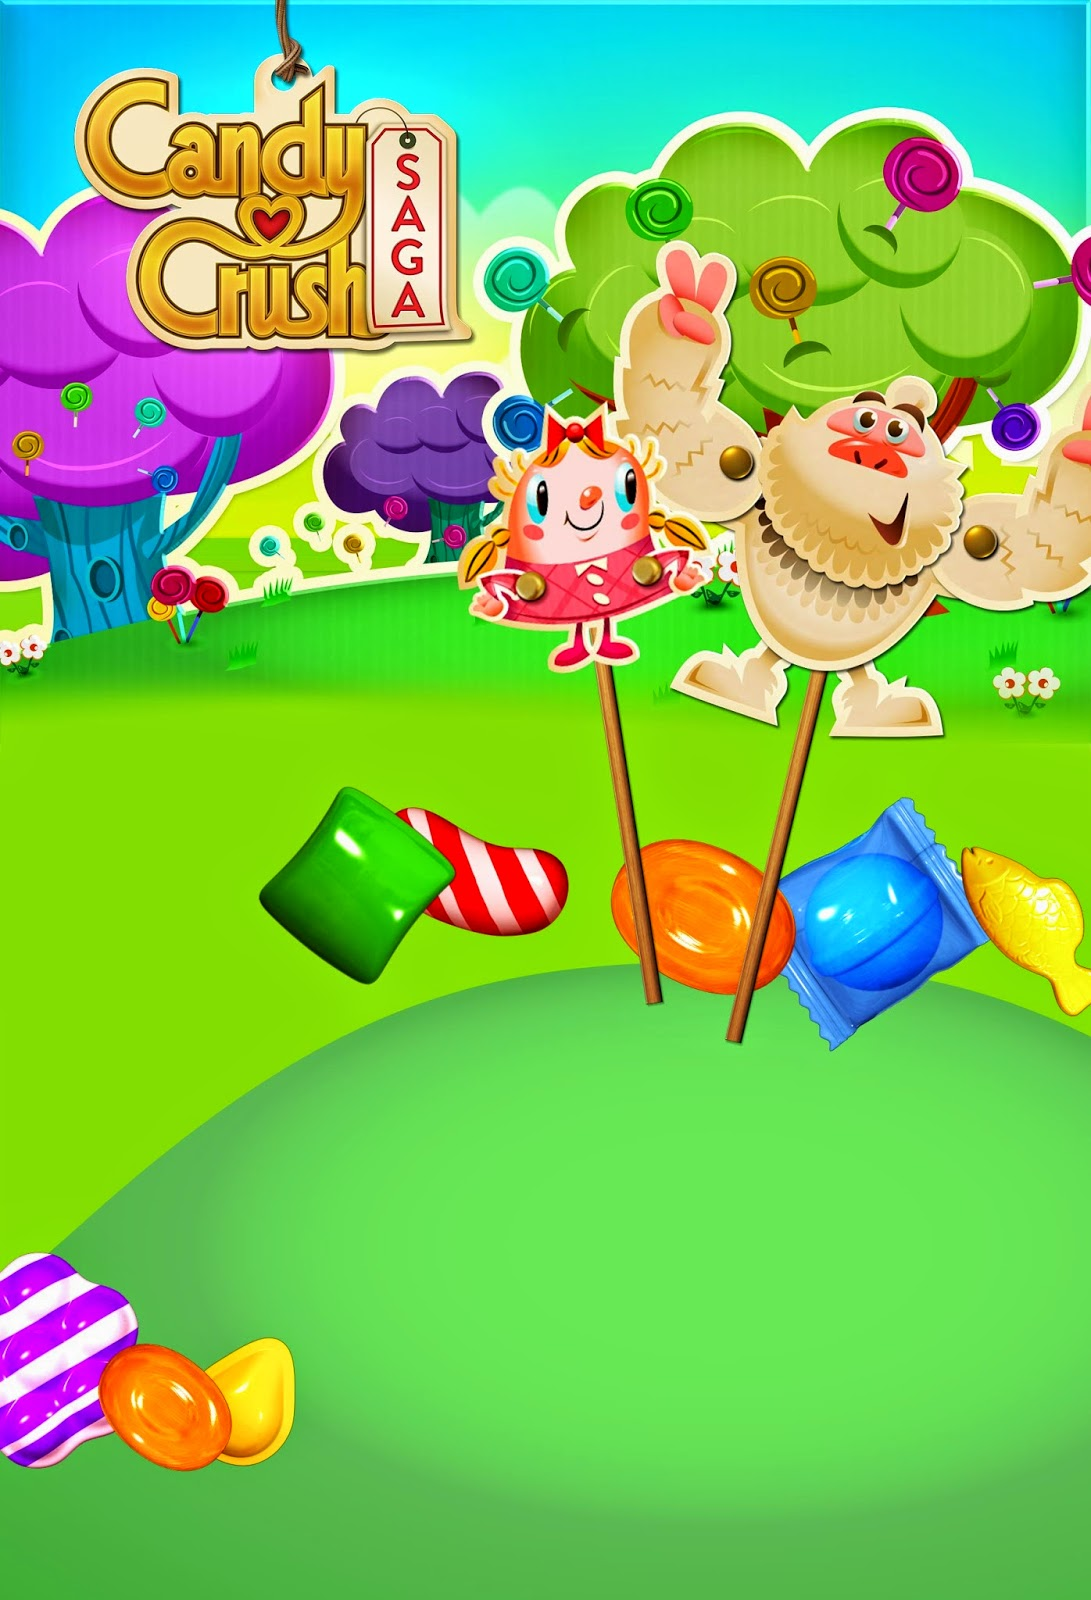 Candy Crush Saga on Facebook  Facebook